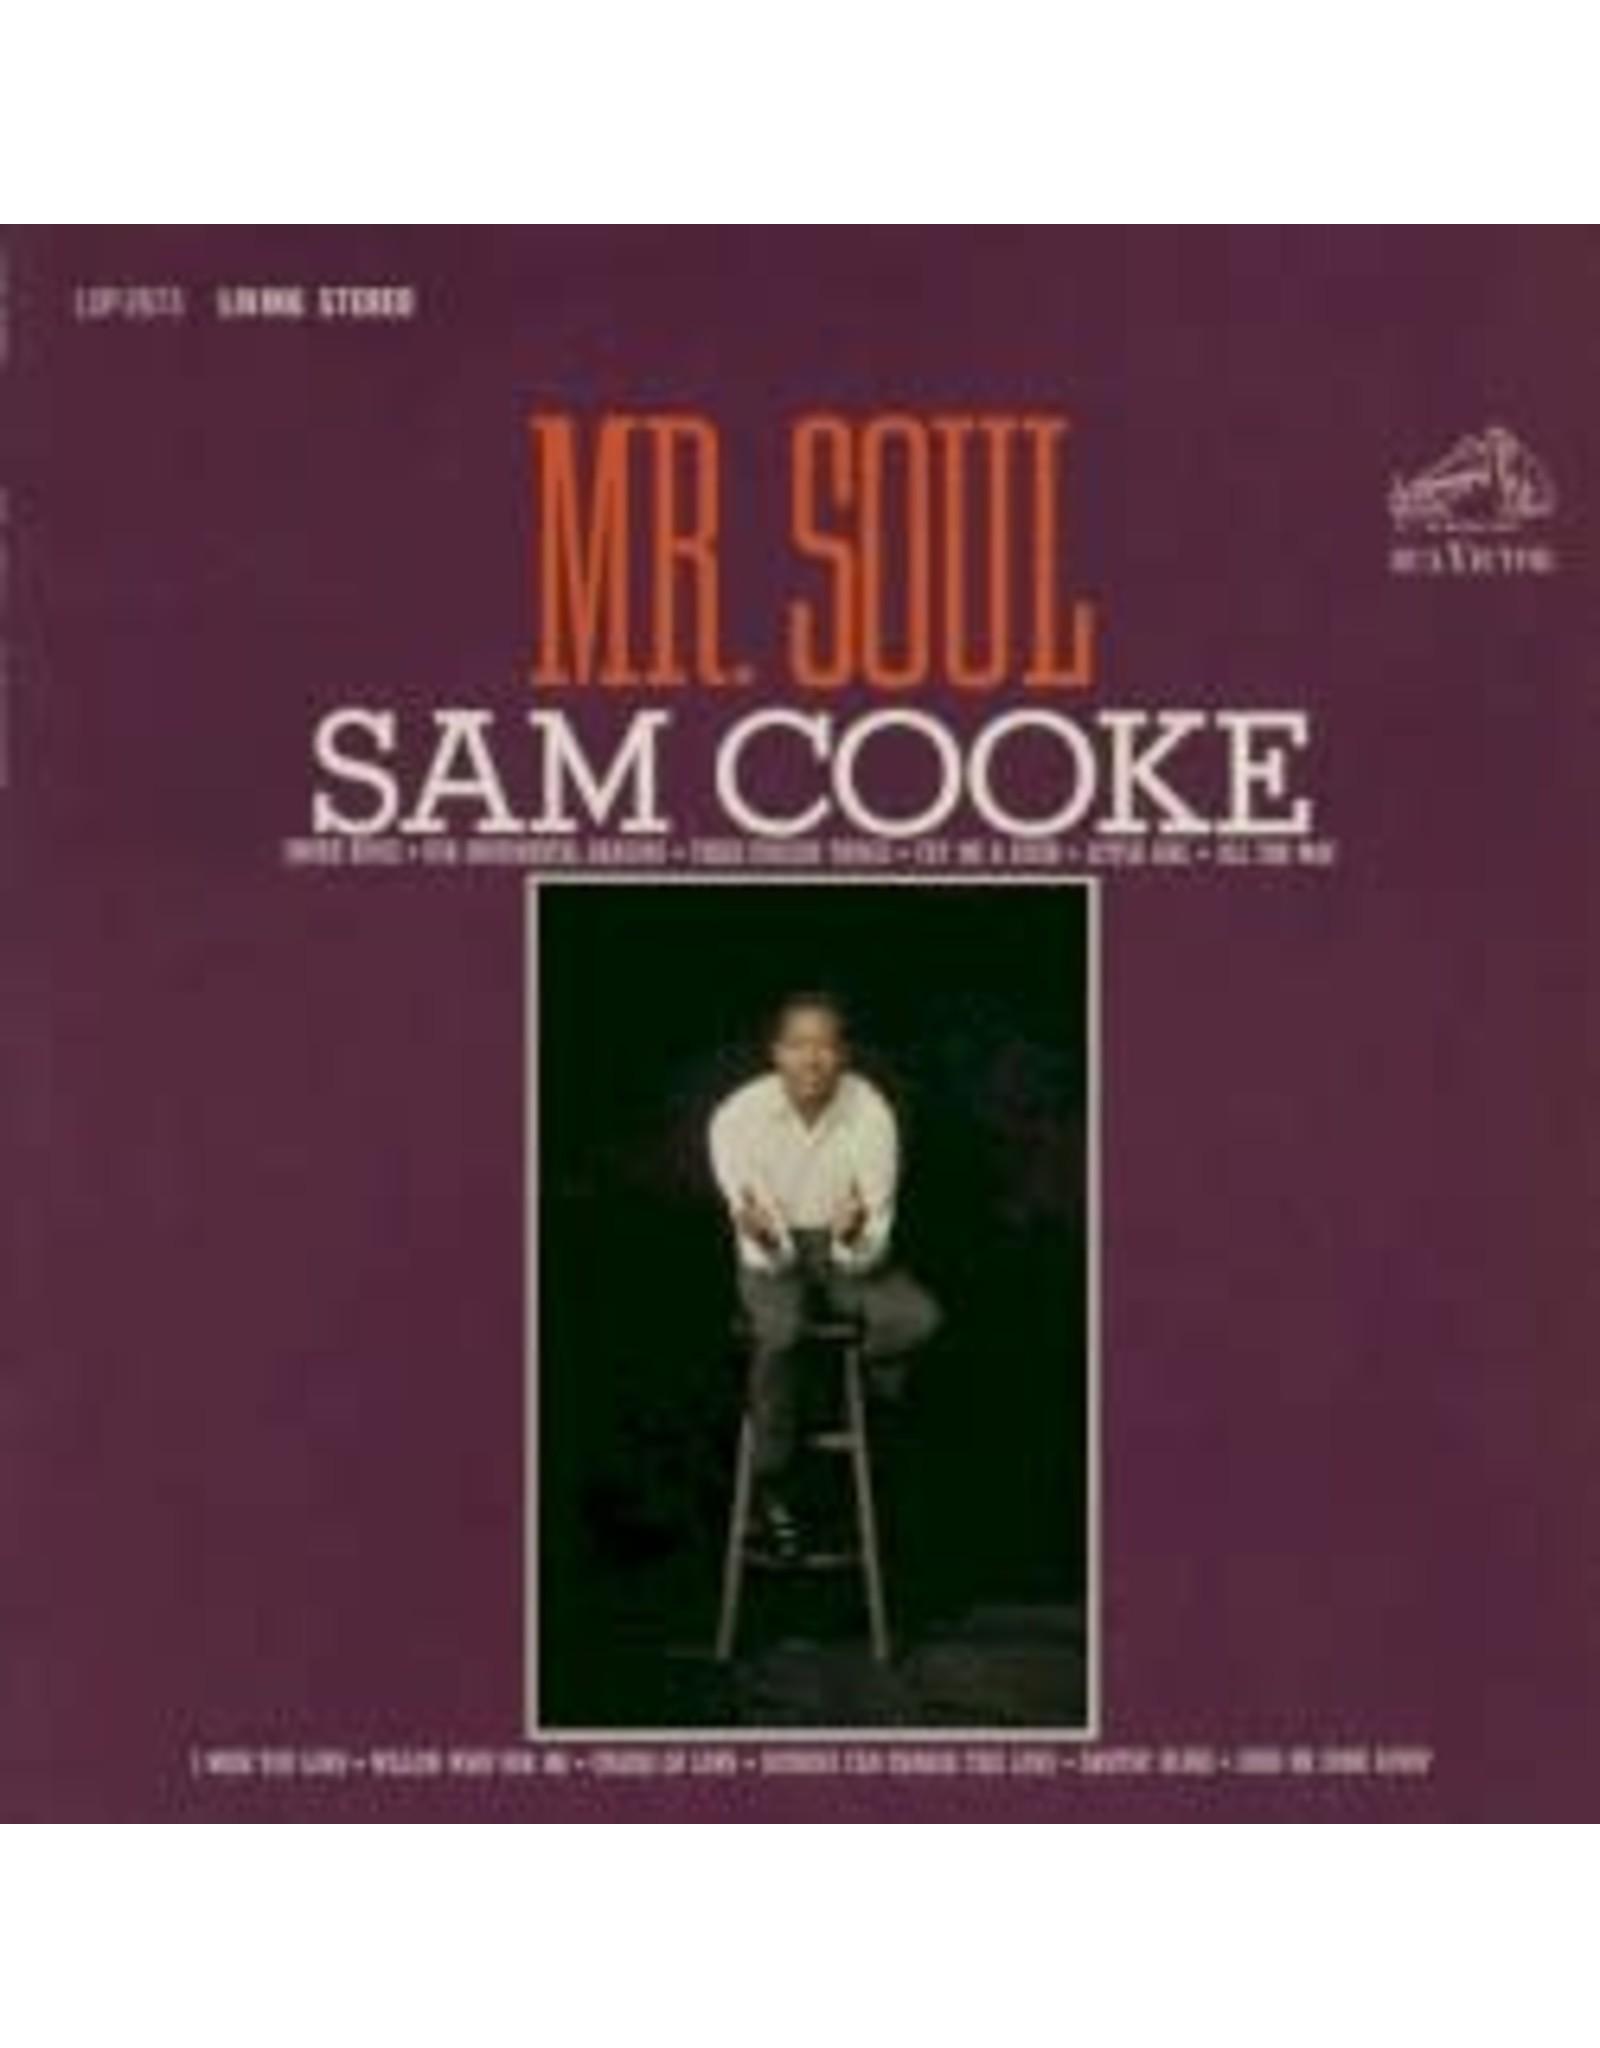 Cooke, Sam - Mr Soul  (MOV Ltd Numbered Purple Marble vinyl)